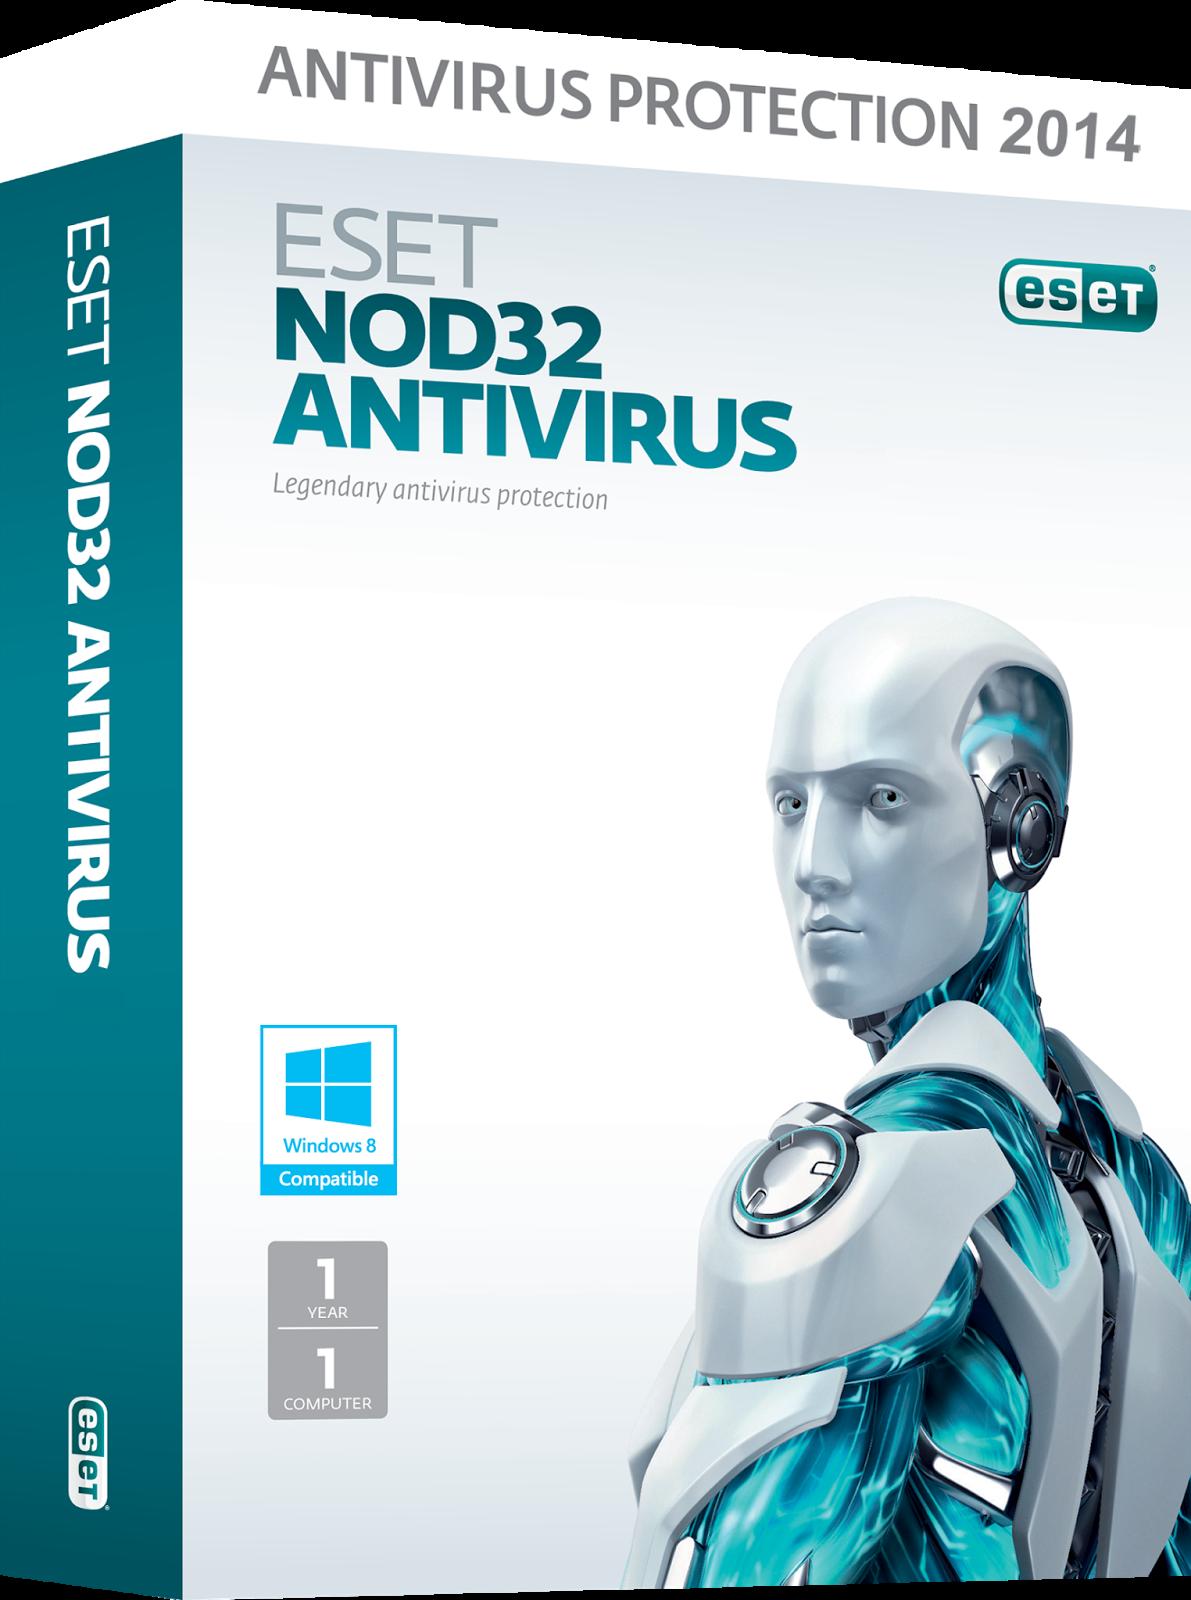 ESET NOD32 Antivirus 8